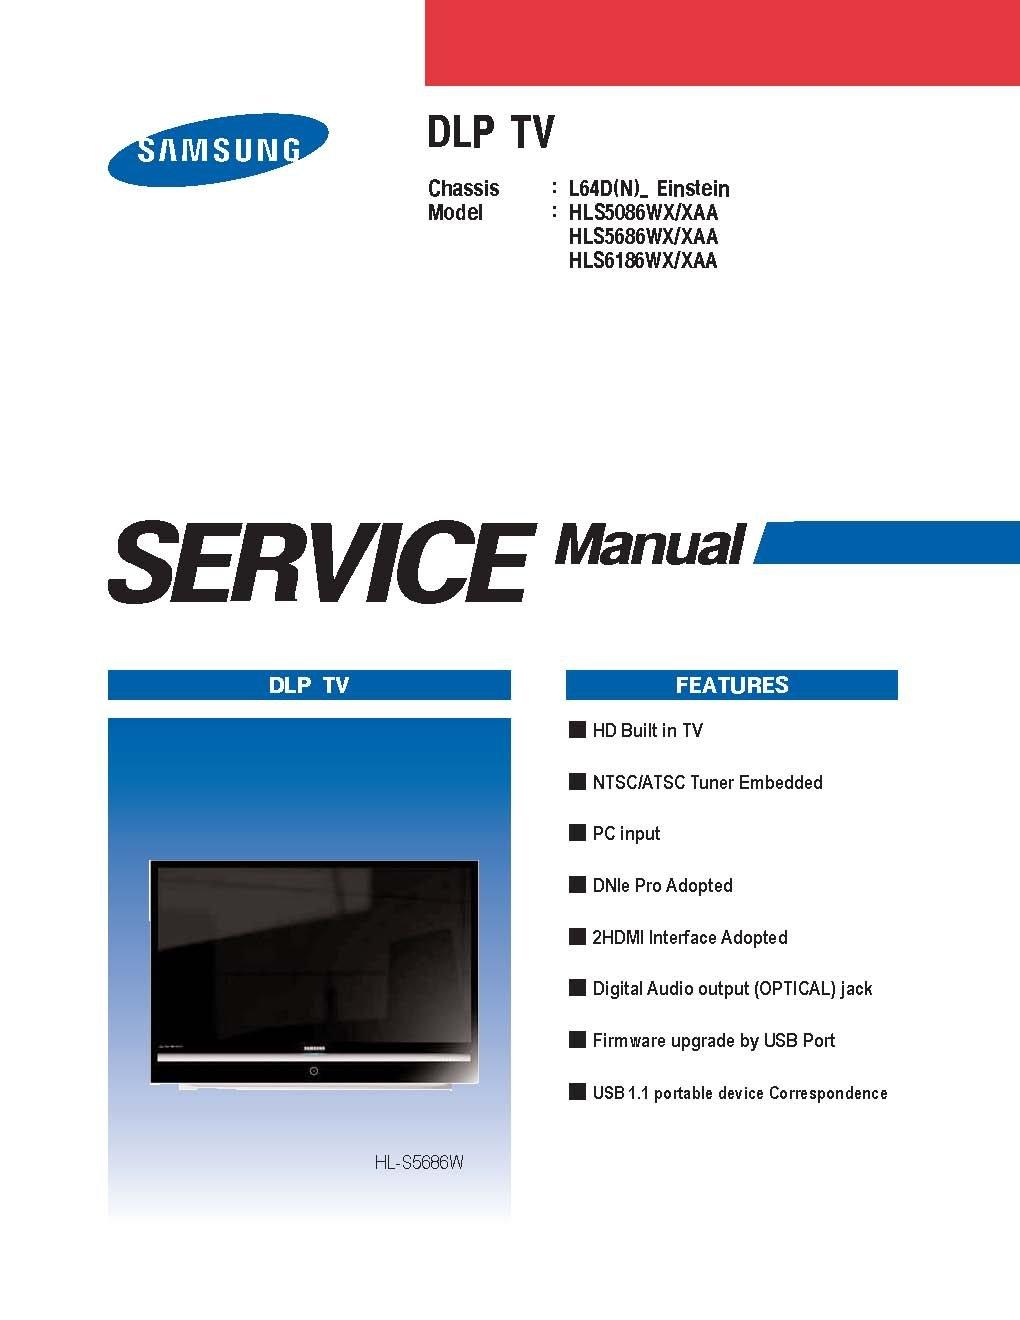 samsung hls5686wx xaa service manual hls5086wx xaa service manual rh amazon com